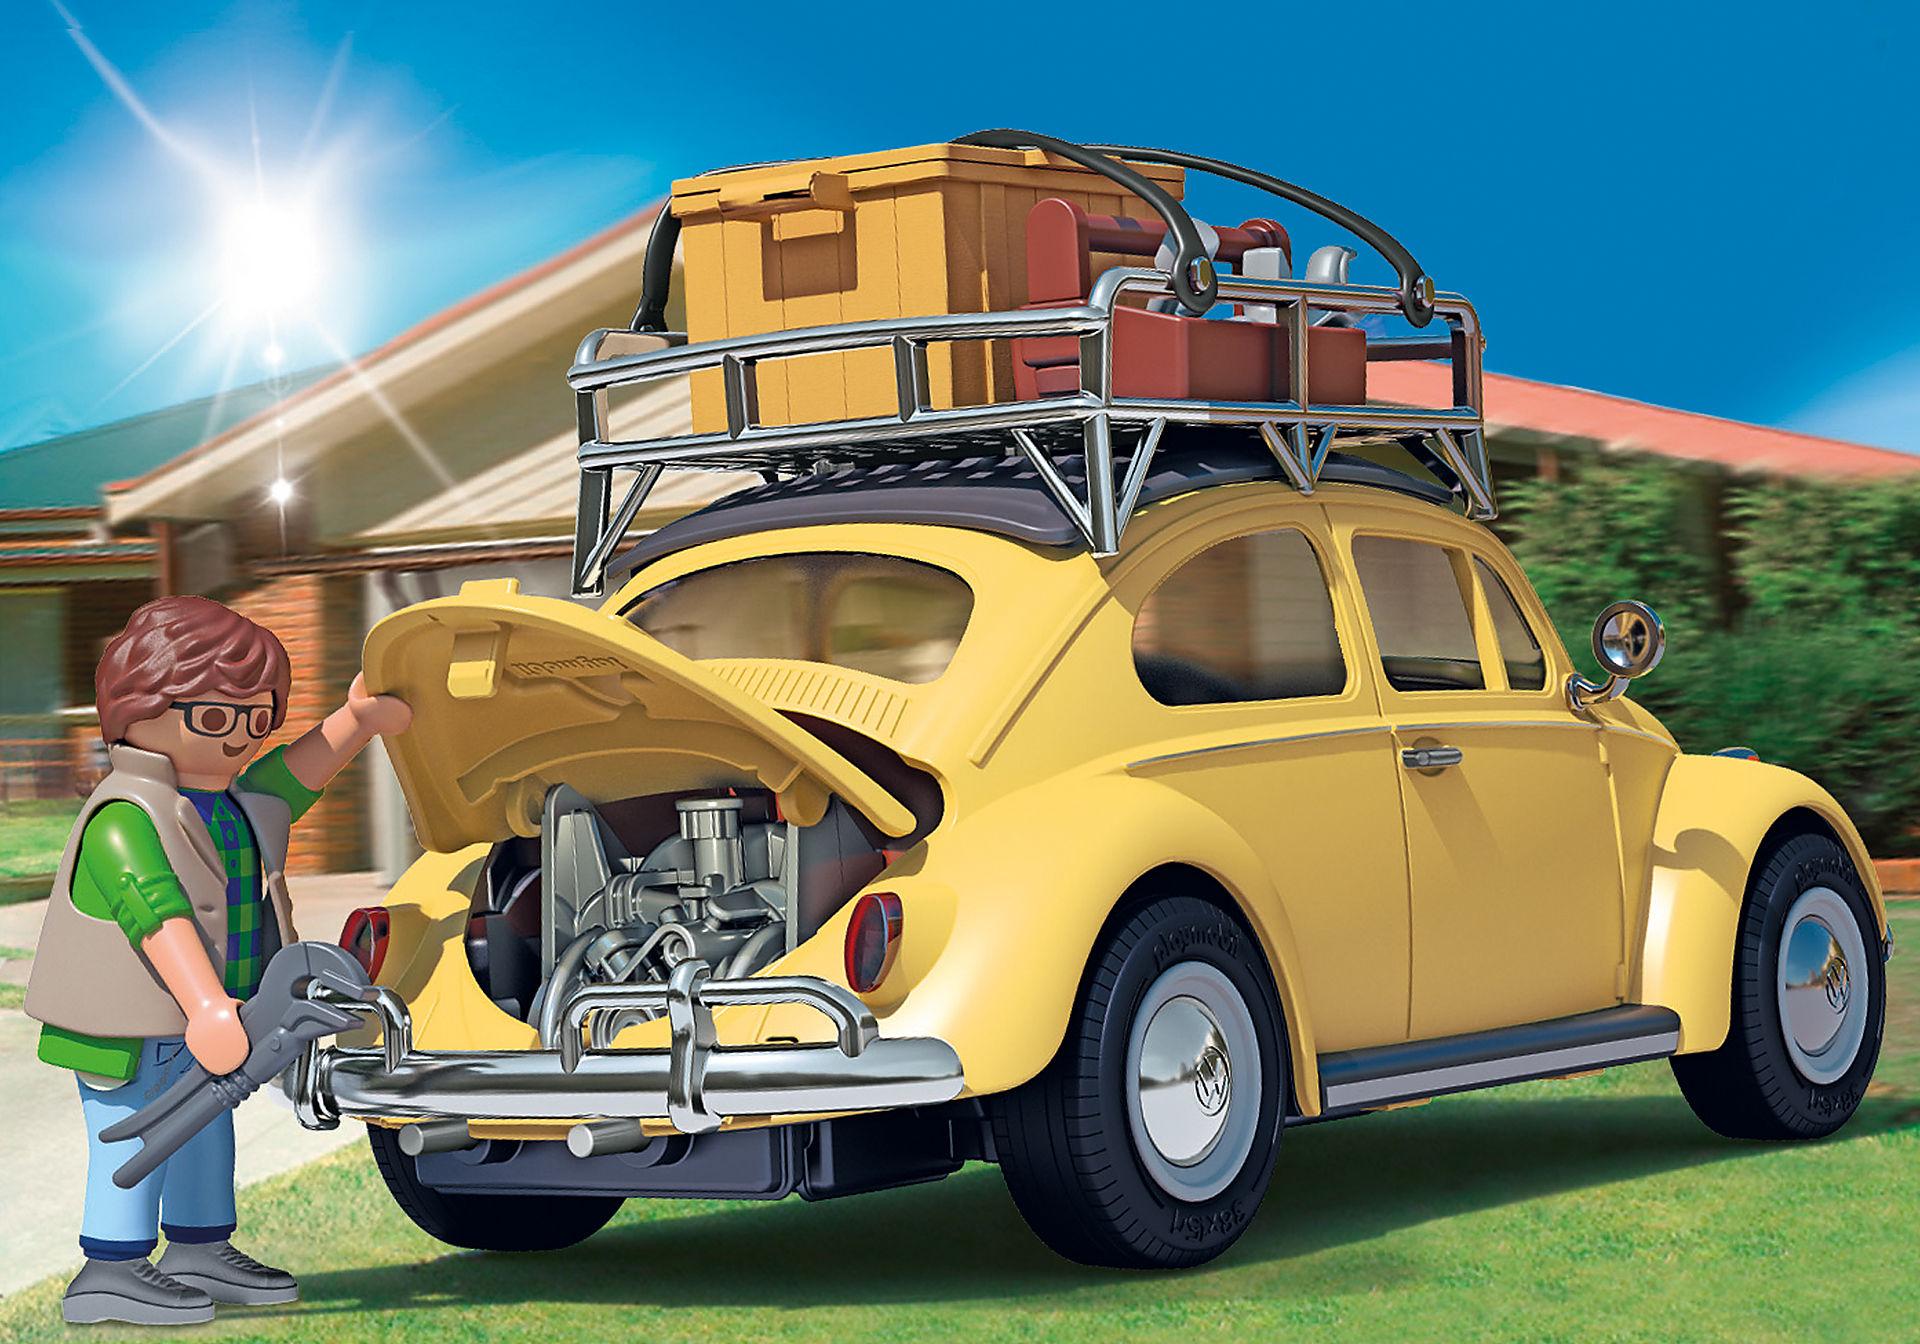 70827 Volkswagen Beetle - Edição especial zoom image6